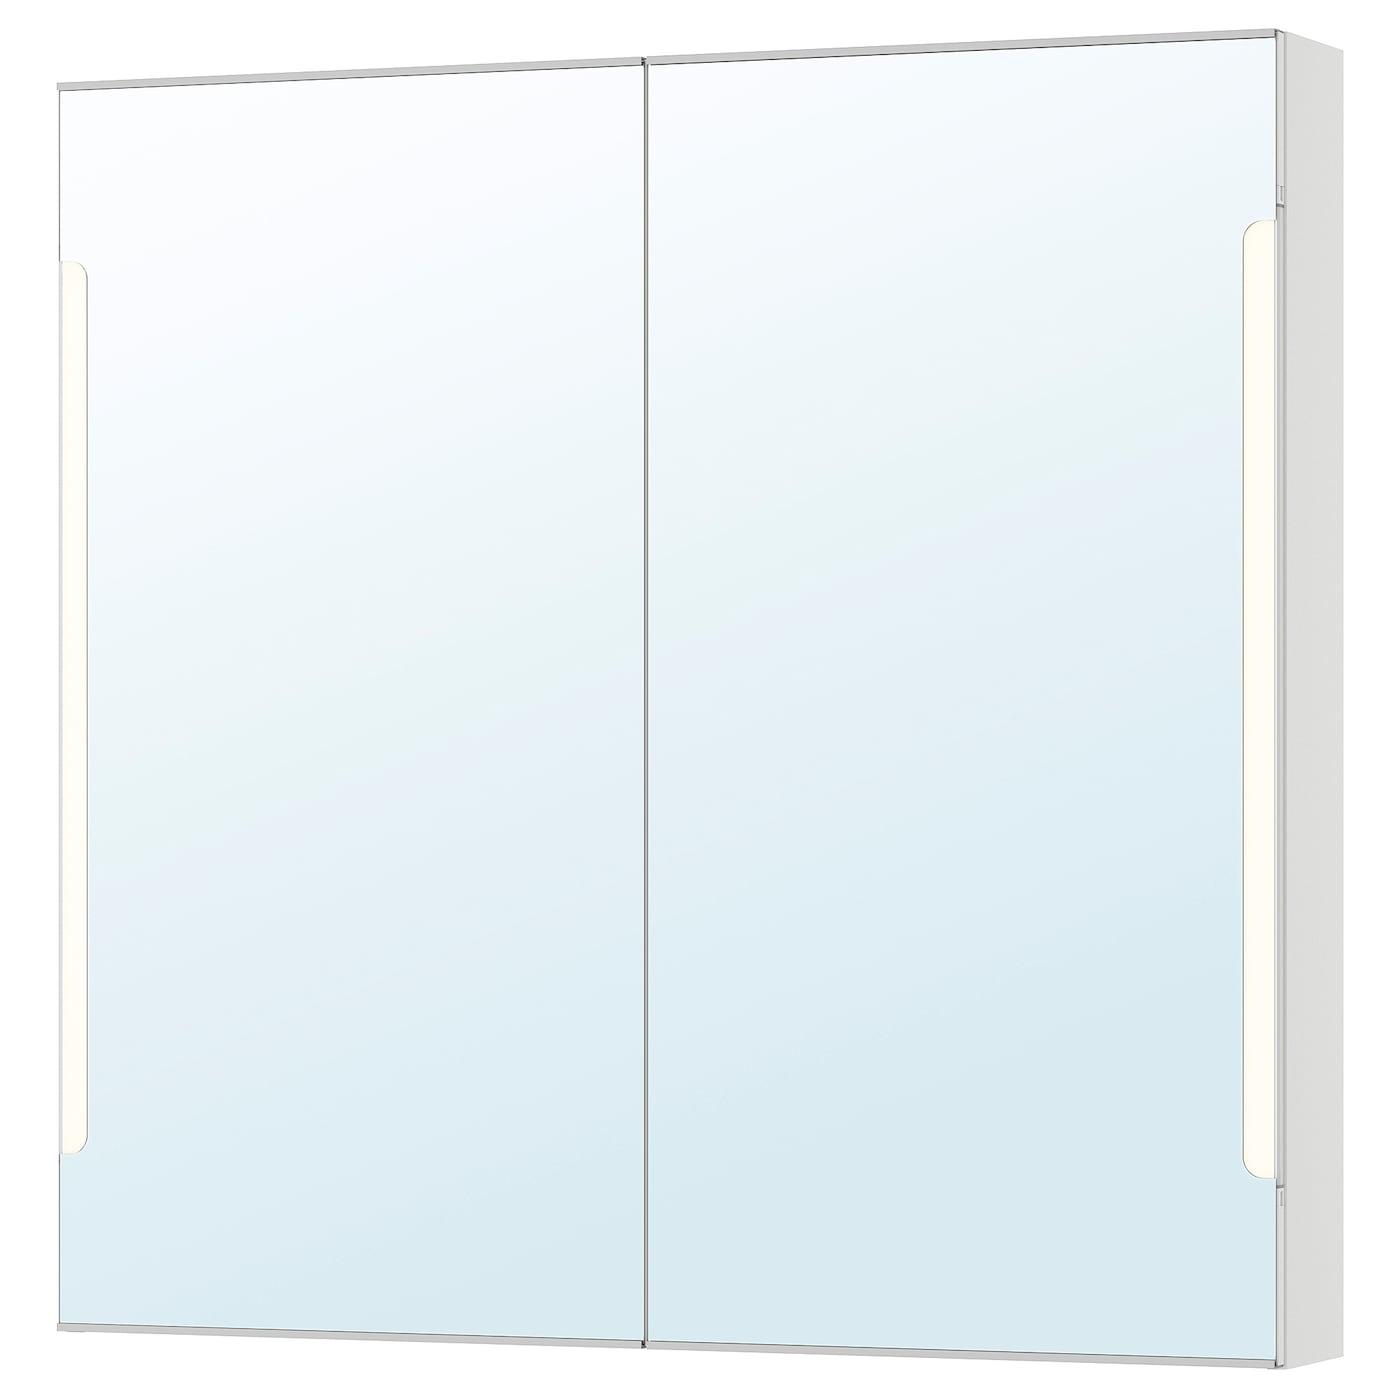 Storjorm Spiegelschrank M 2 Turen Int Bel Weiss Ikea Deutschland